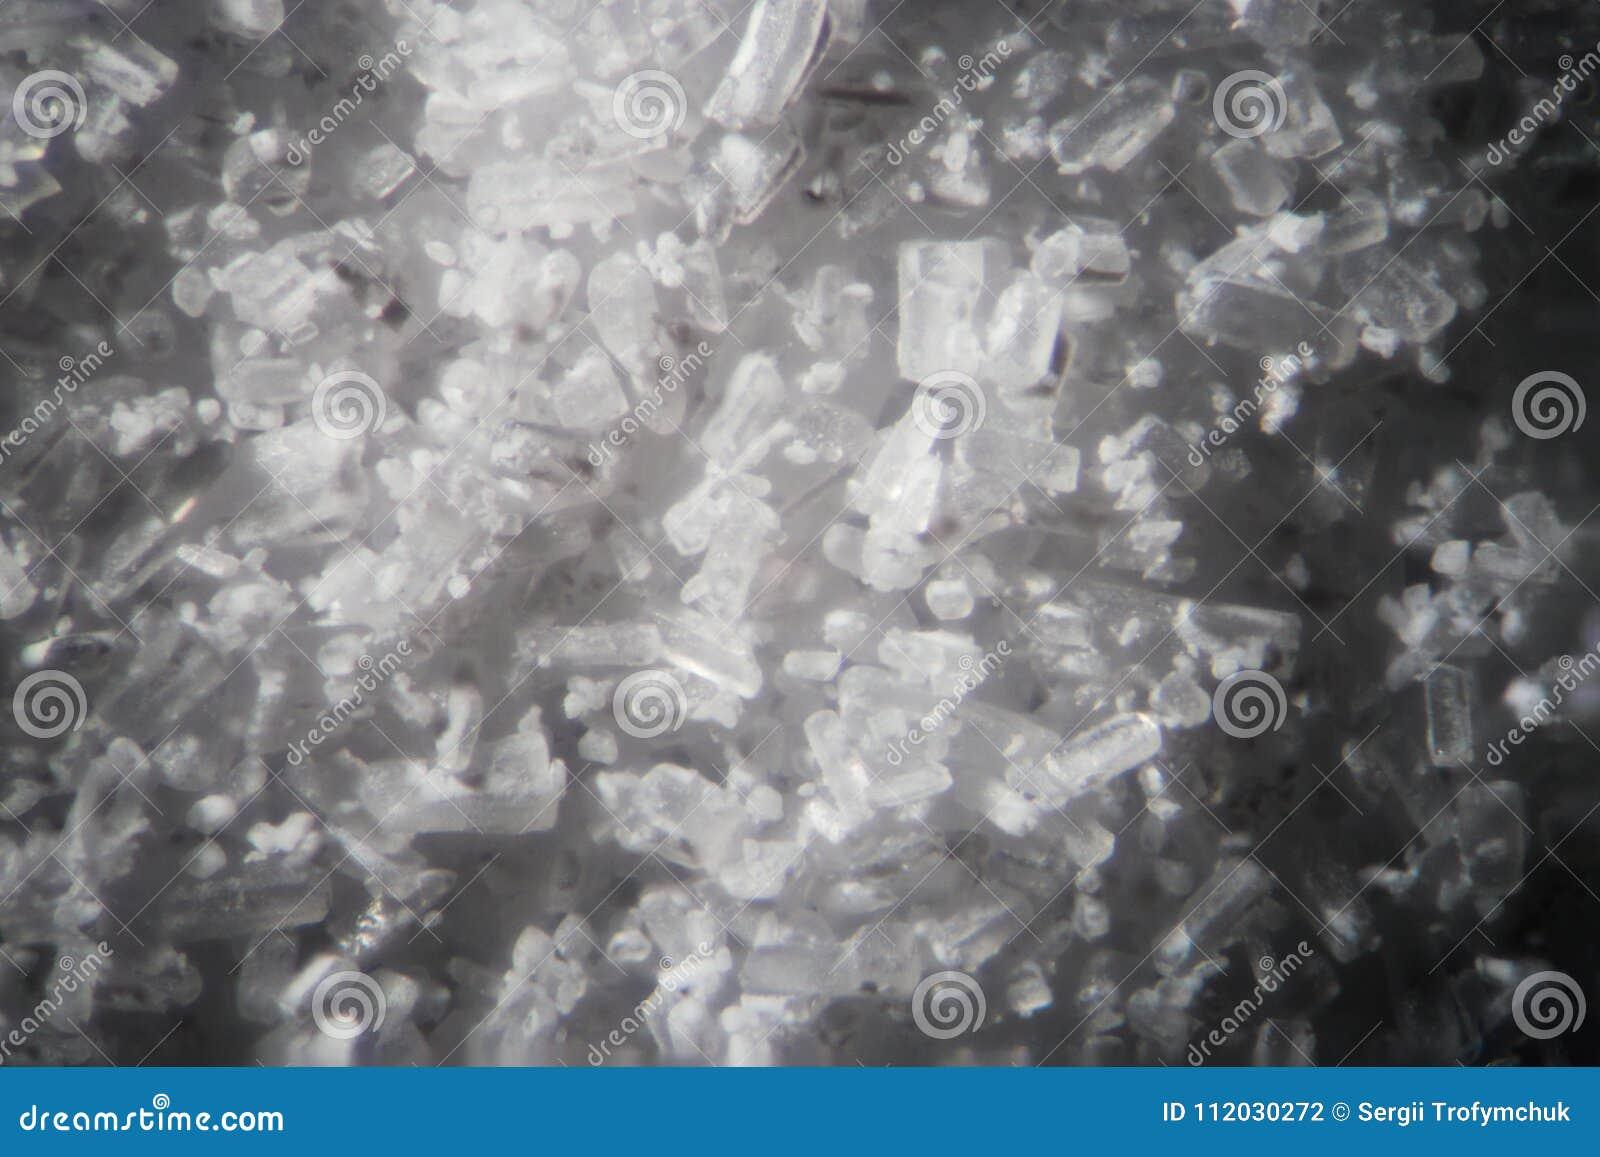 Os cristais da creatina pelo microscópio olham como a metanfetamina Suplemento dietético atlético no close-up do supermacro dos d